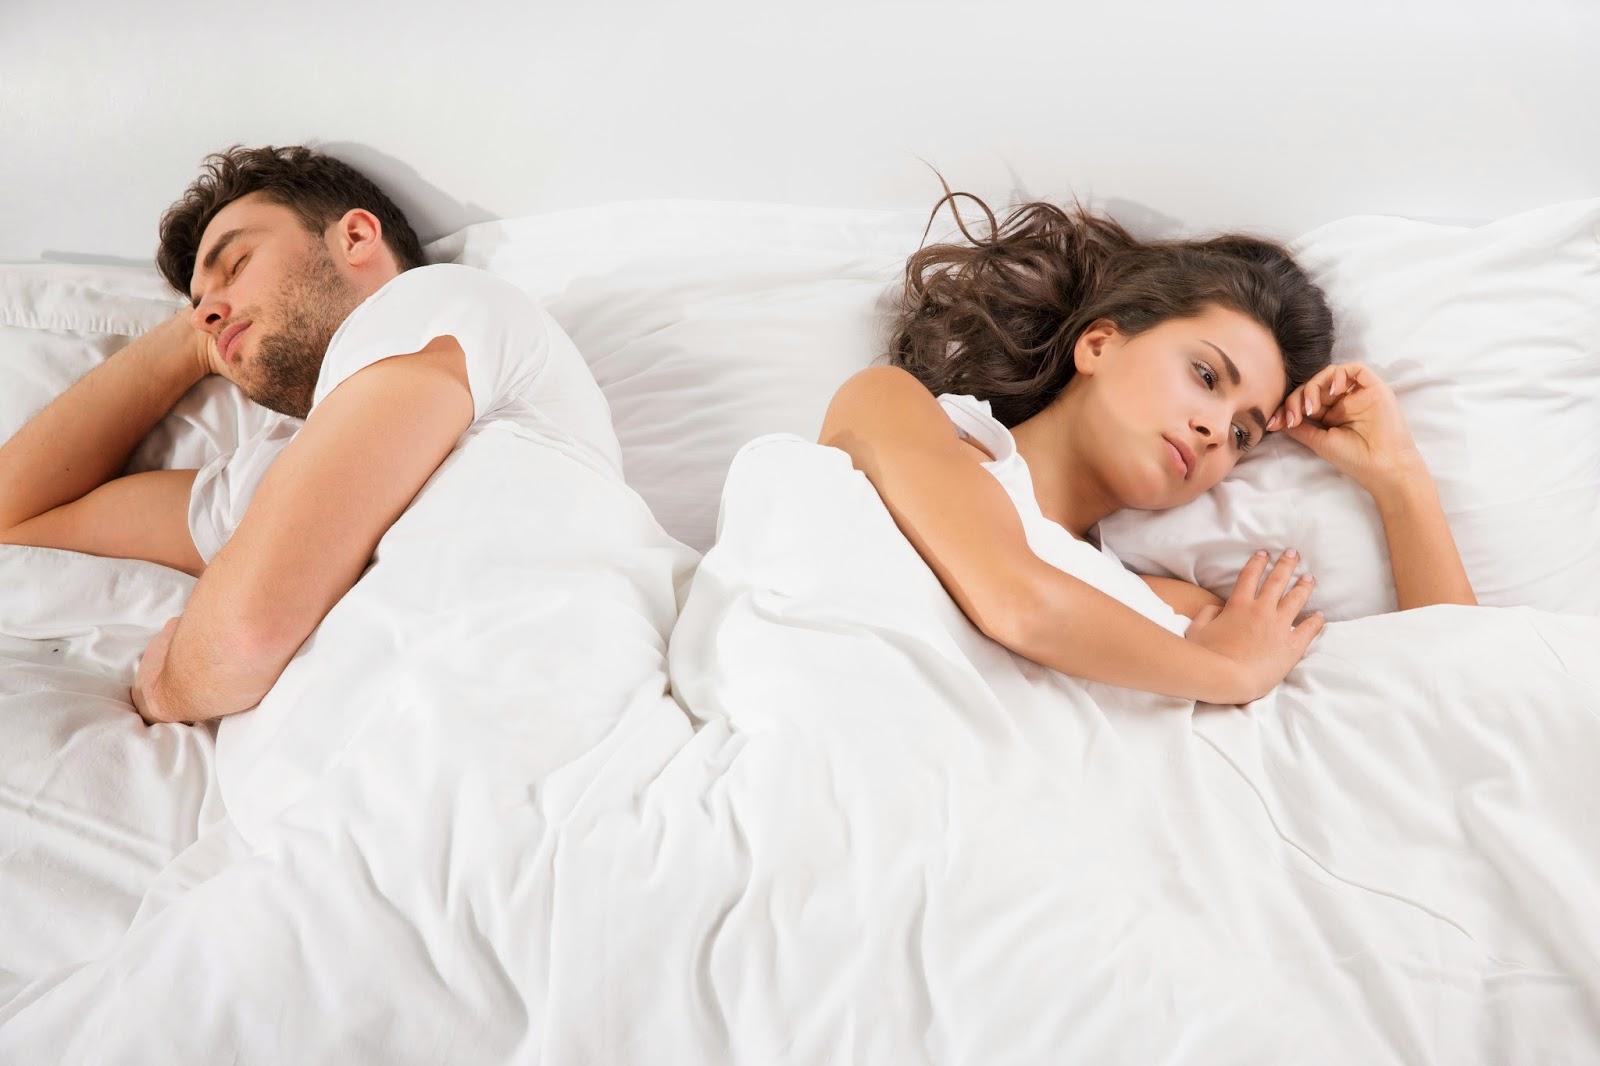 Шлюхи на кровати муж с женой картинки анал огромные груди